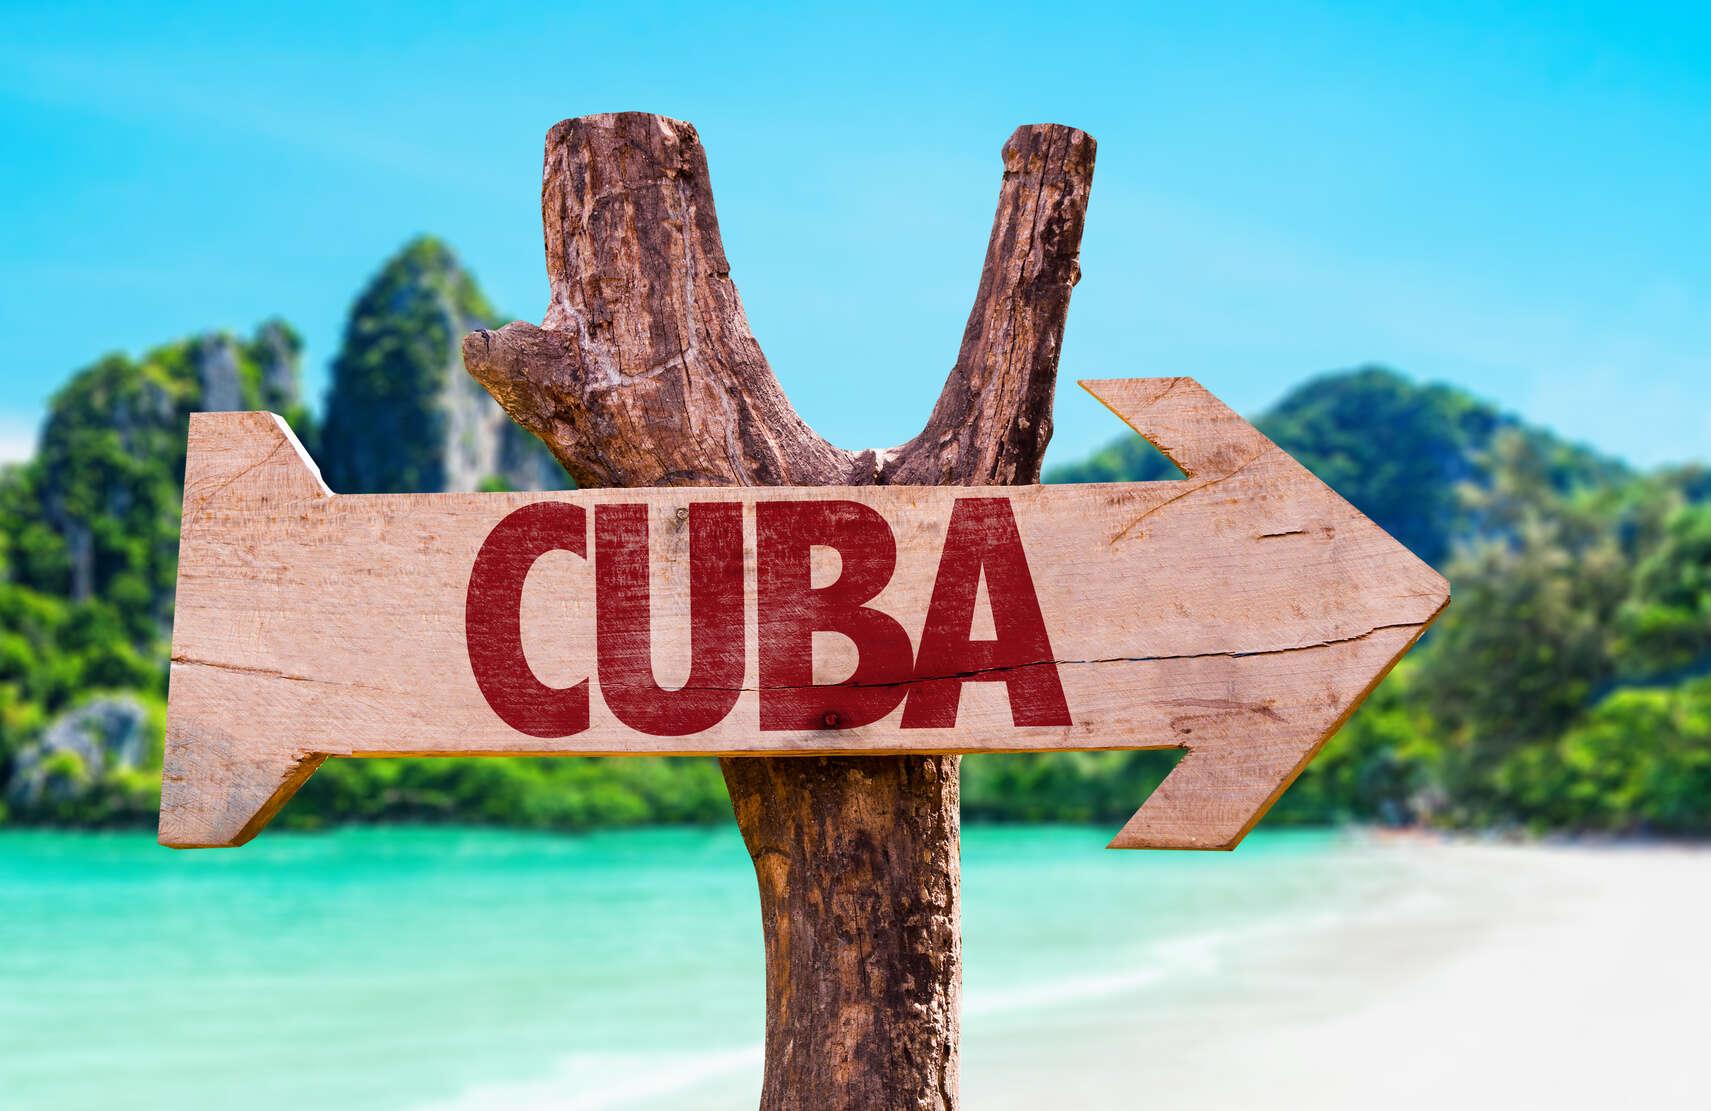 Vacationing in Cuba: Top 5 Destinations